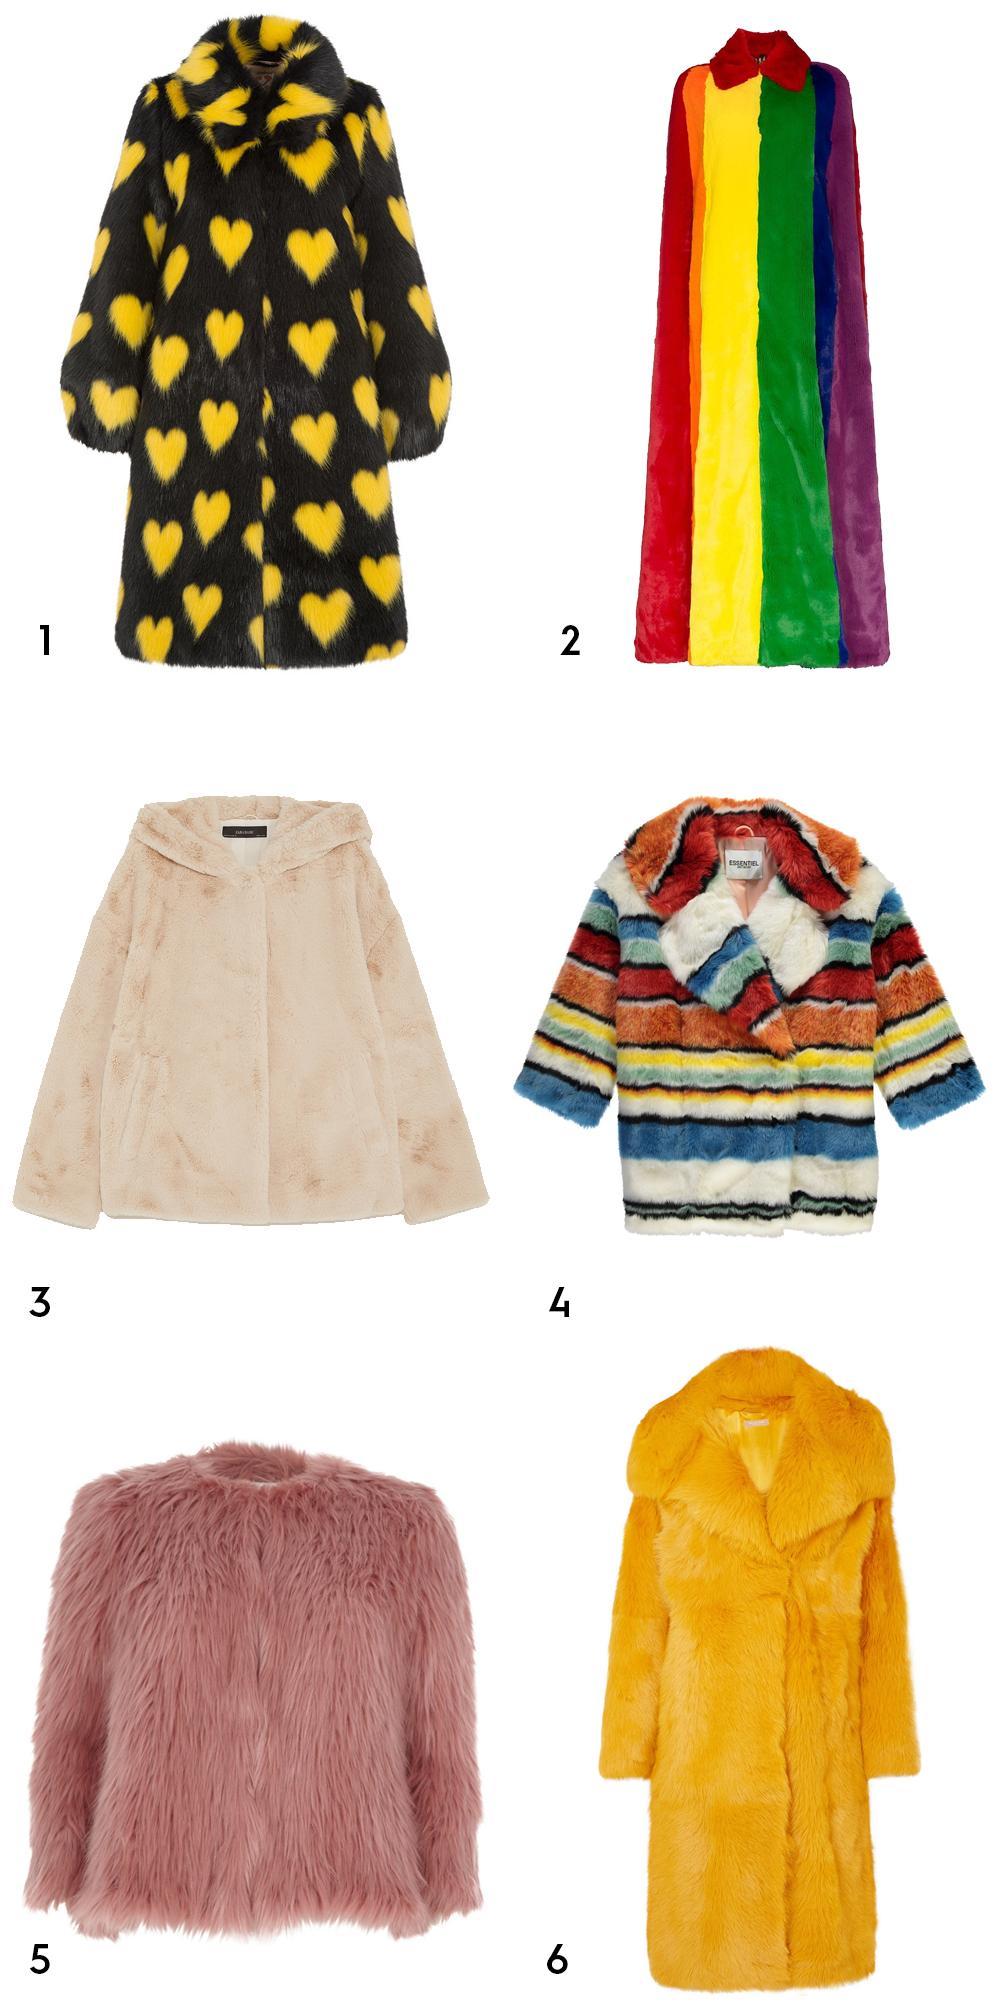 1Lorca black coat, €727.73 at shrimps.co.uk, 2 rainbow stripe faux fur cape coat by Burberry, €4,790 at net-a-porter.com, 3 hooded jacket,€49.95 at zara.com, 4 colourful stripe faux fur coat, €395 at essentiel-antwerp.com, 5 petite pink faux fur knit coat, €60 at riverisland.ie, 6 shearling coat by Michael Kors, €8,625 at net-a-porter.com